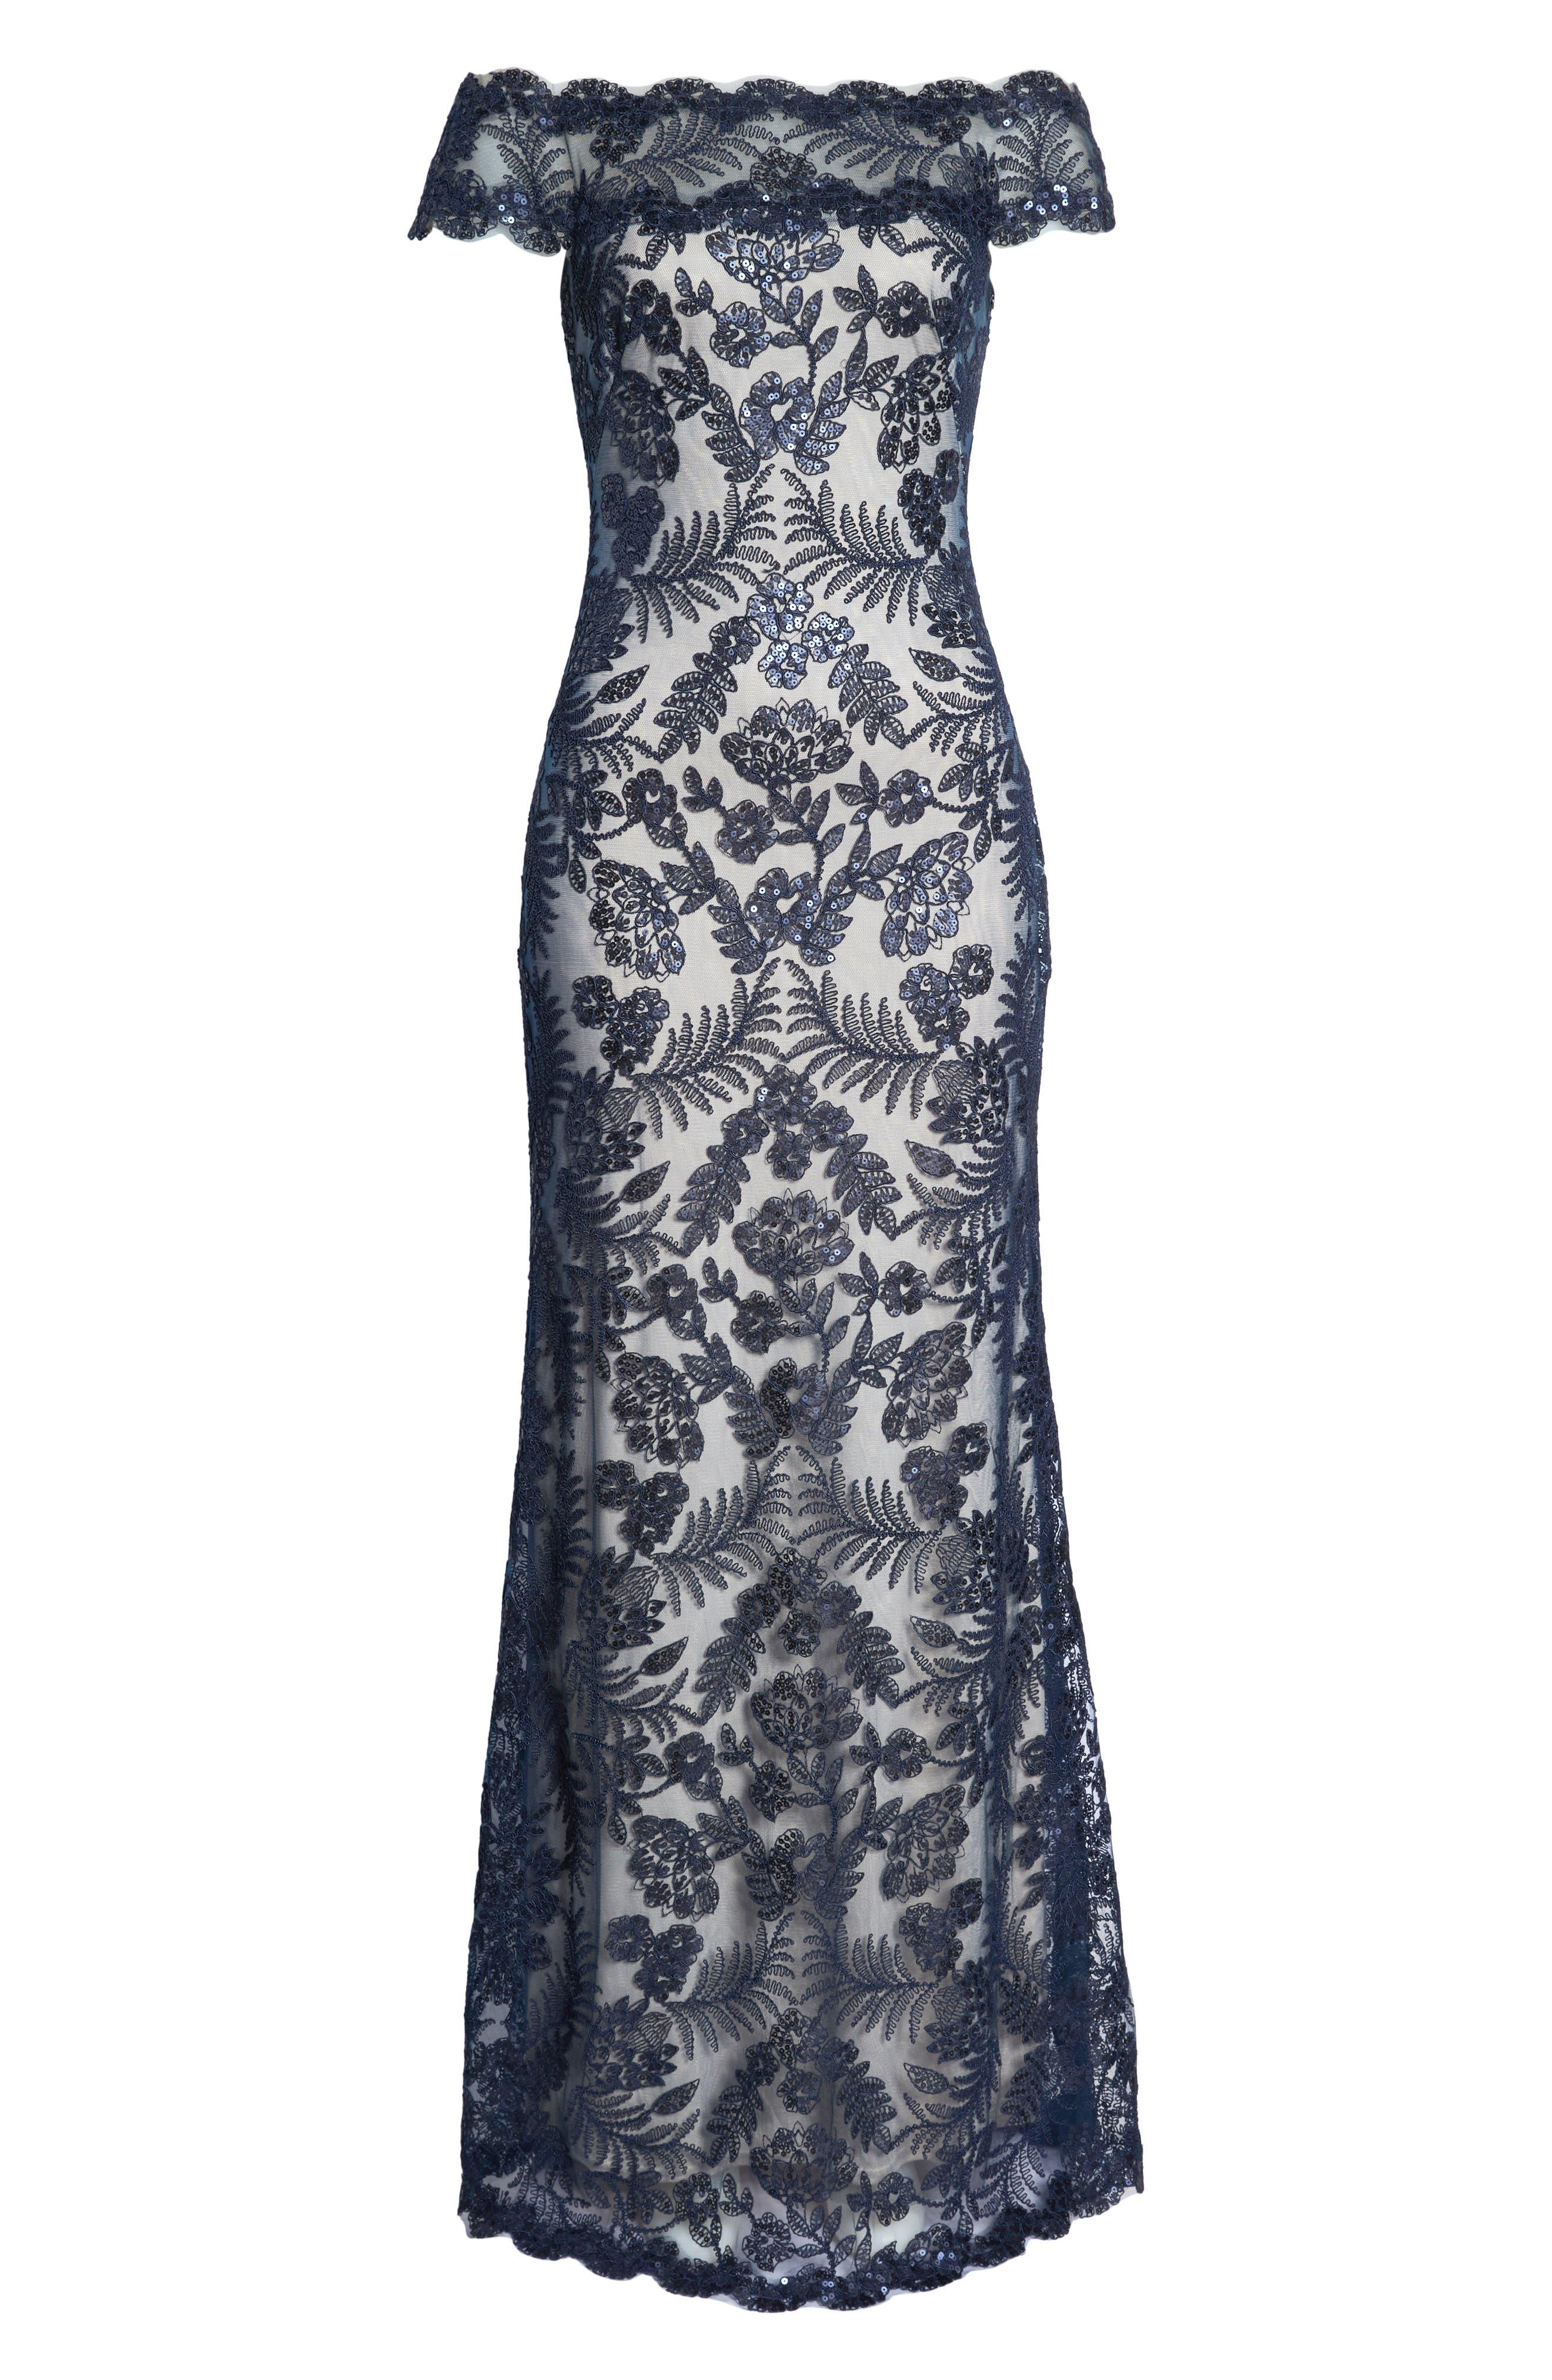 TADASHI SHOJI, Illusion Neck Sequin Lace Gown, Alternate thumbnail 8, color, 410